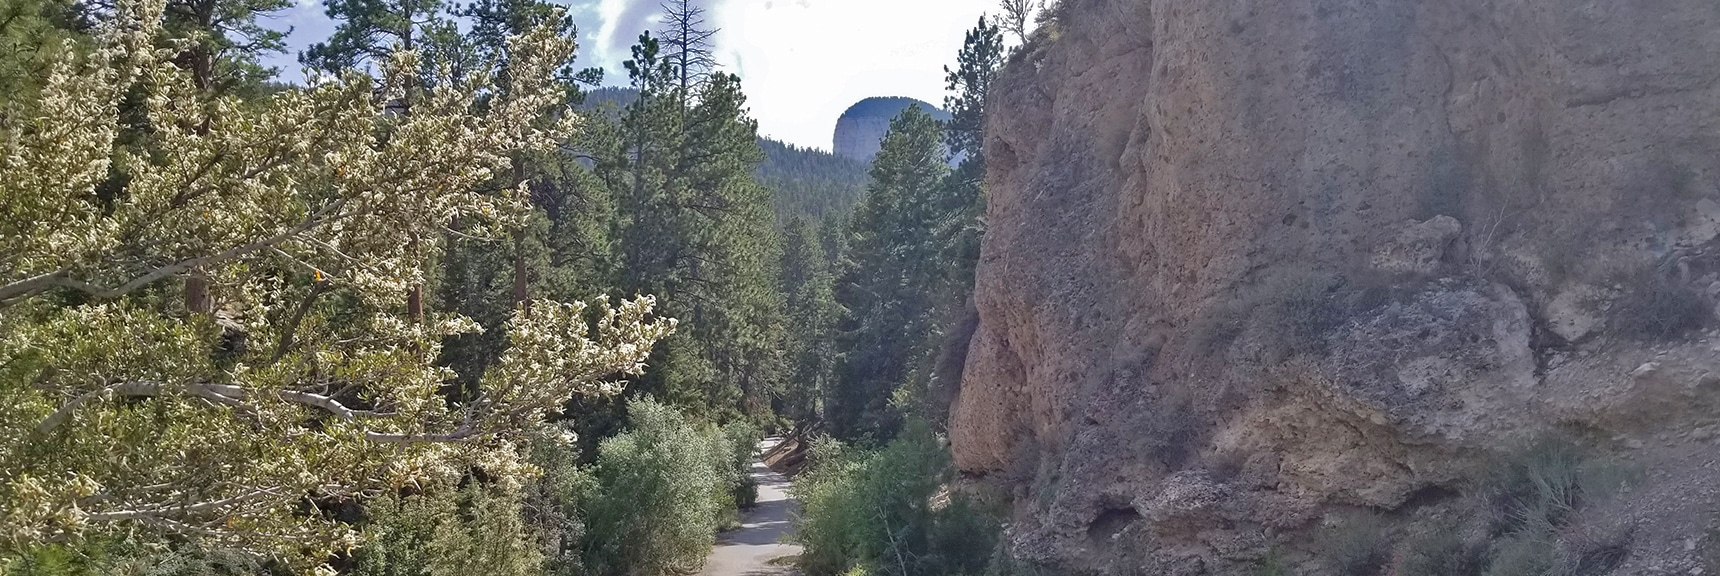 Entrance to Deer Creek Picnic Area Just Off Deer Creek Road - Mummy's Toe in Distance   Deer Creek Rd - Mummy Cliffs - Mummy Springs - Raintree - Fletcher Peak - Cougar Ridge Trail Circuit   Mt Charleston Wilderness   Spring Mountains, Nevada